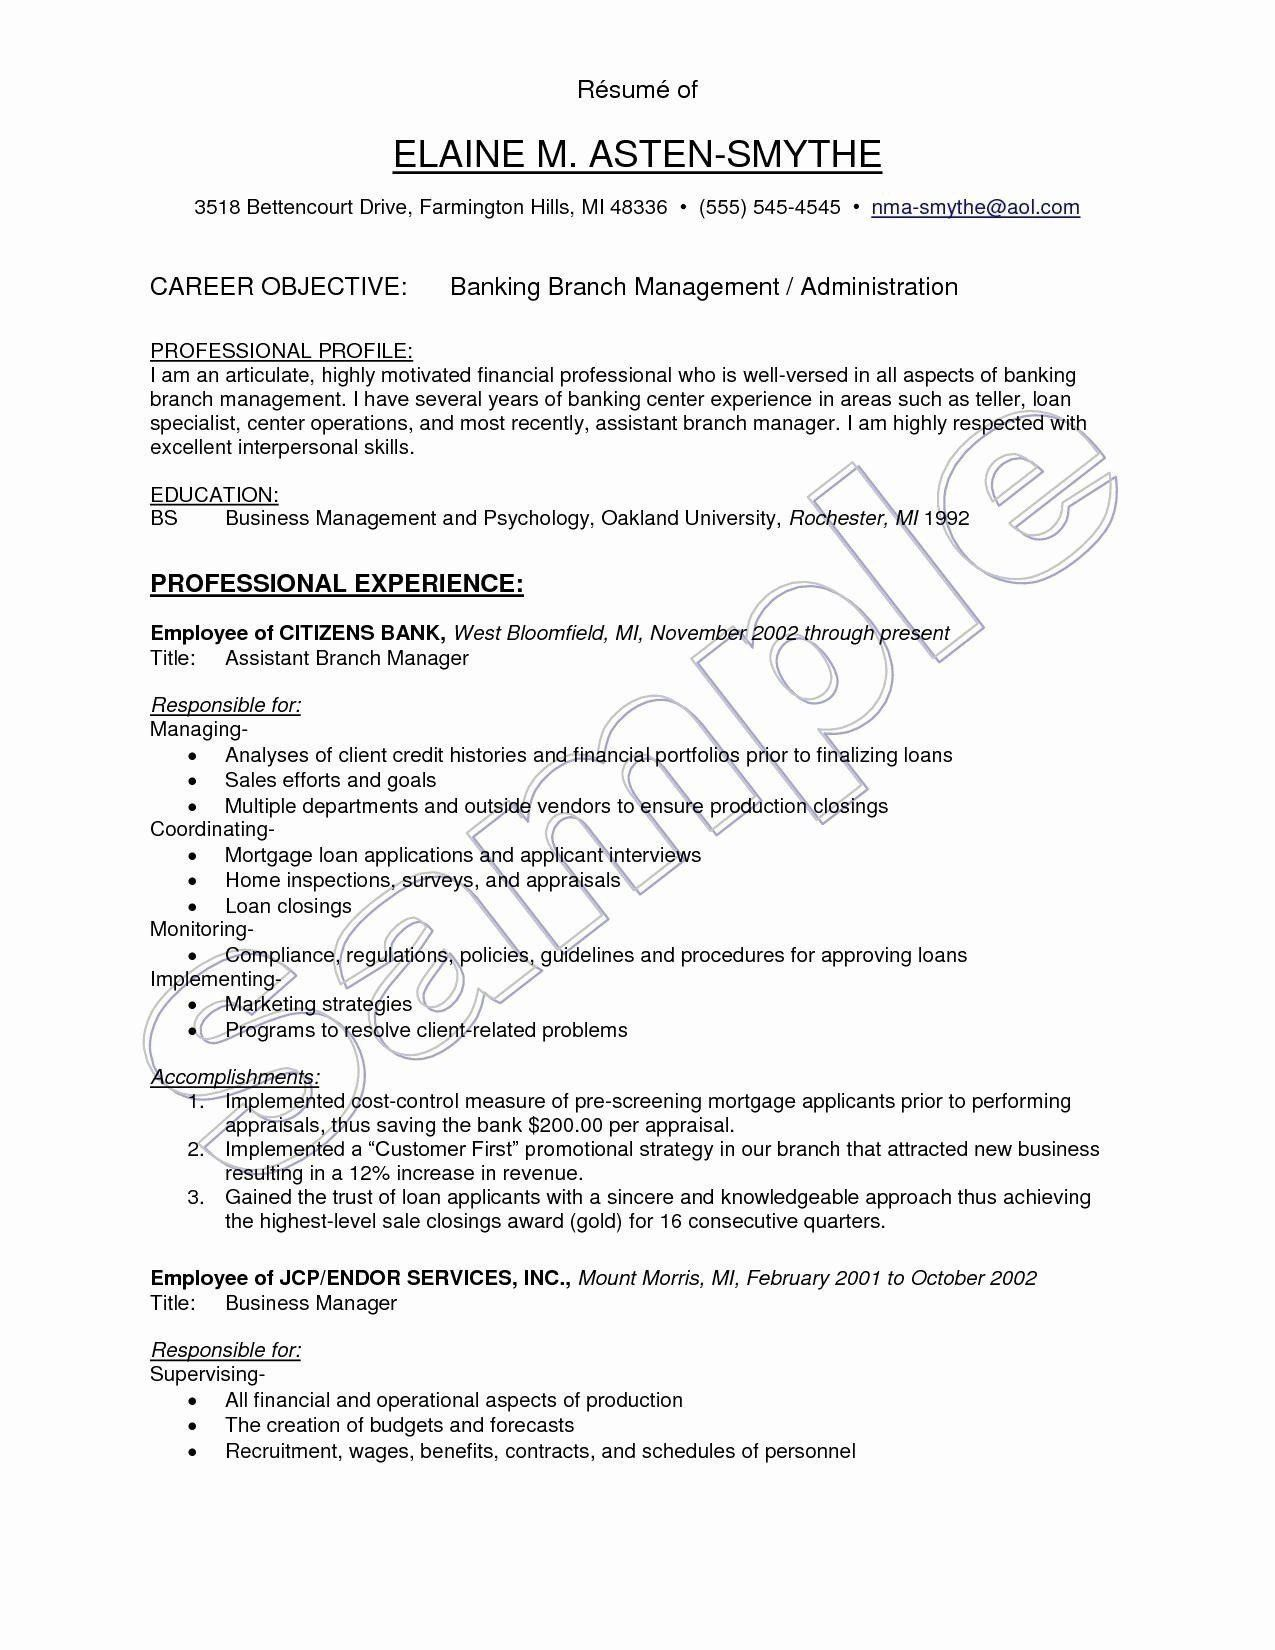 Resume Objectives For Teaching 9 Resume Objectives